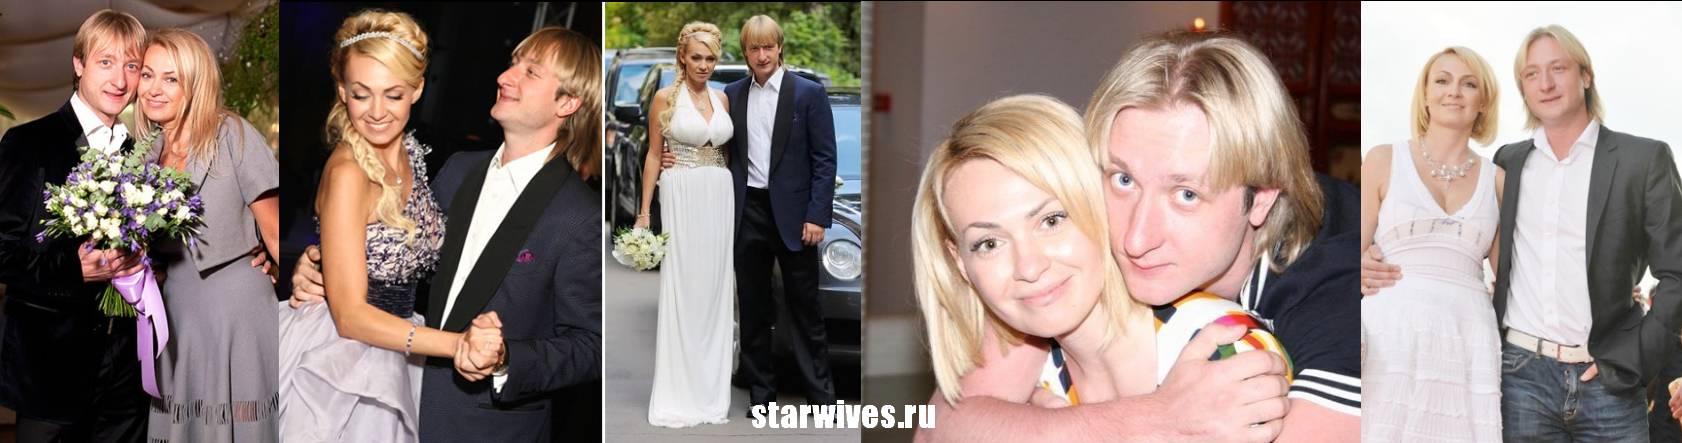 Жена плющенко яна рудковская